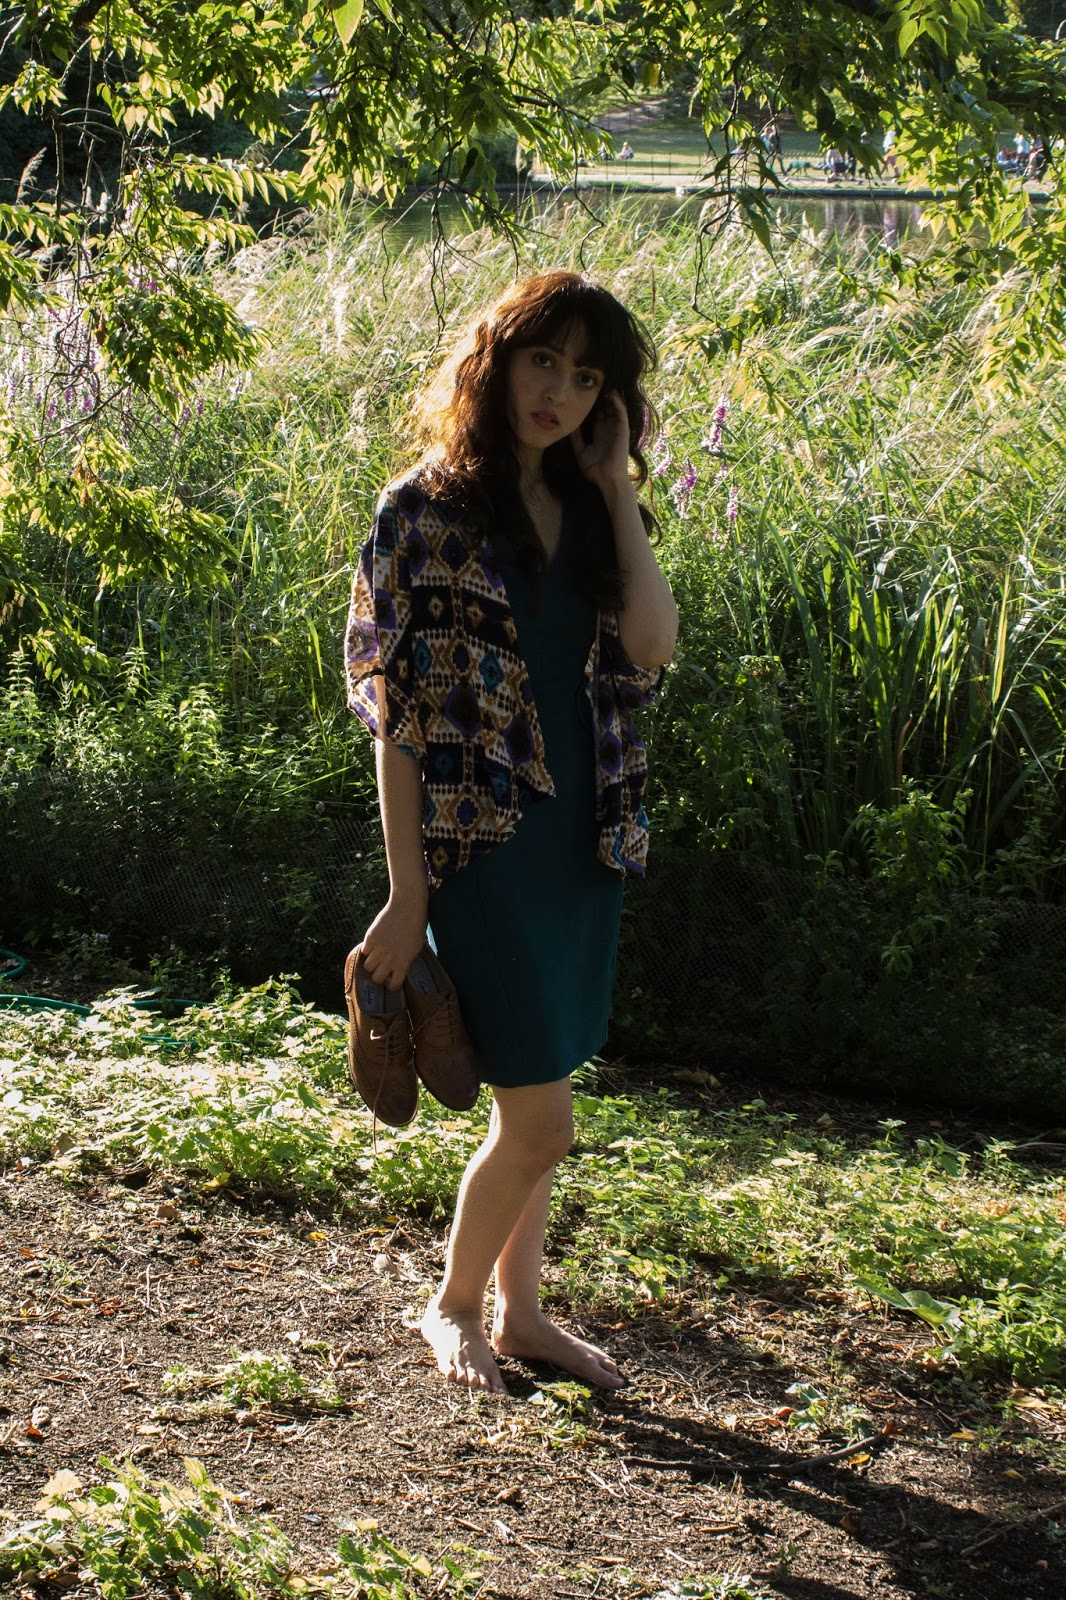 Zara Rosario shot and styled by Karina So. for Ses Rêveries September 2015 | Ses Rêveries